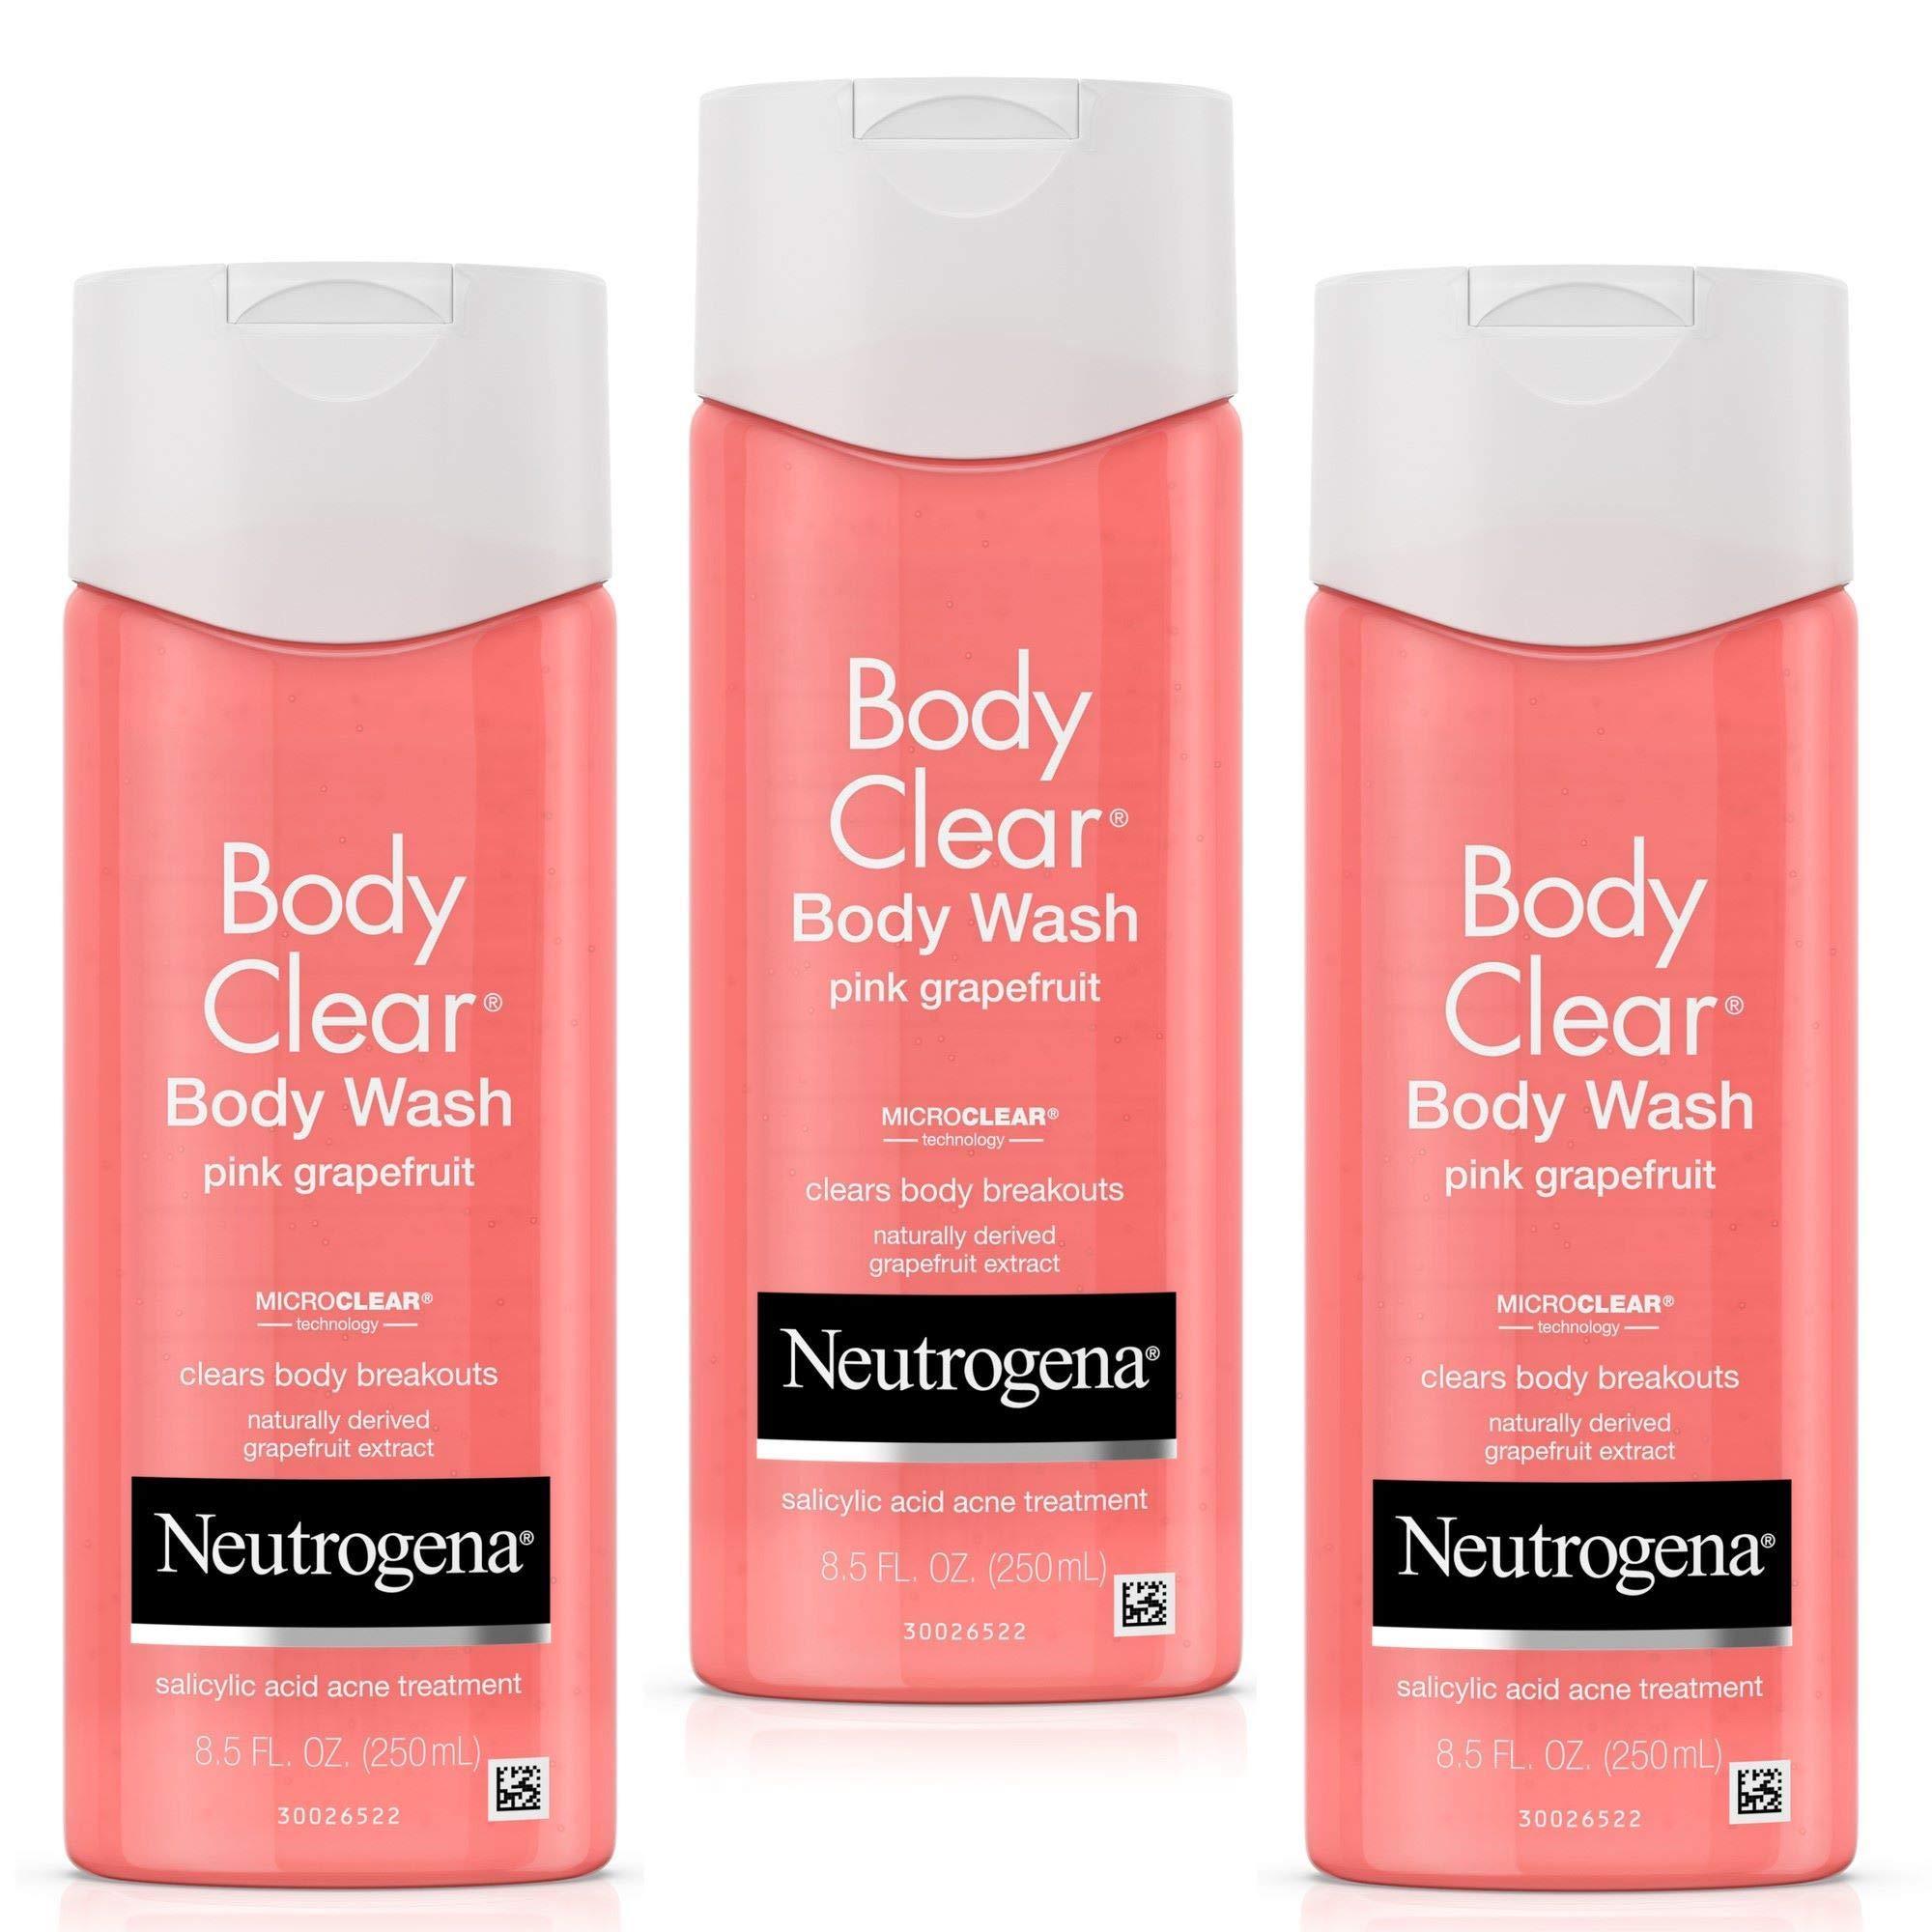 Neutrogena Body Clear Acne Treatment Body Wash with Salicylic Acid Acne Medicine to Prevent Body Breakouts, Pink Grapefruit Salicylic Acid Acne Body Wash for Back Chest & Shoulders, 8.5 fl.oz (3 Pack) by Neutrogena